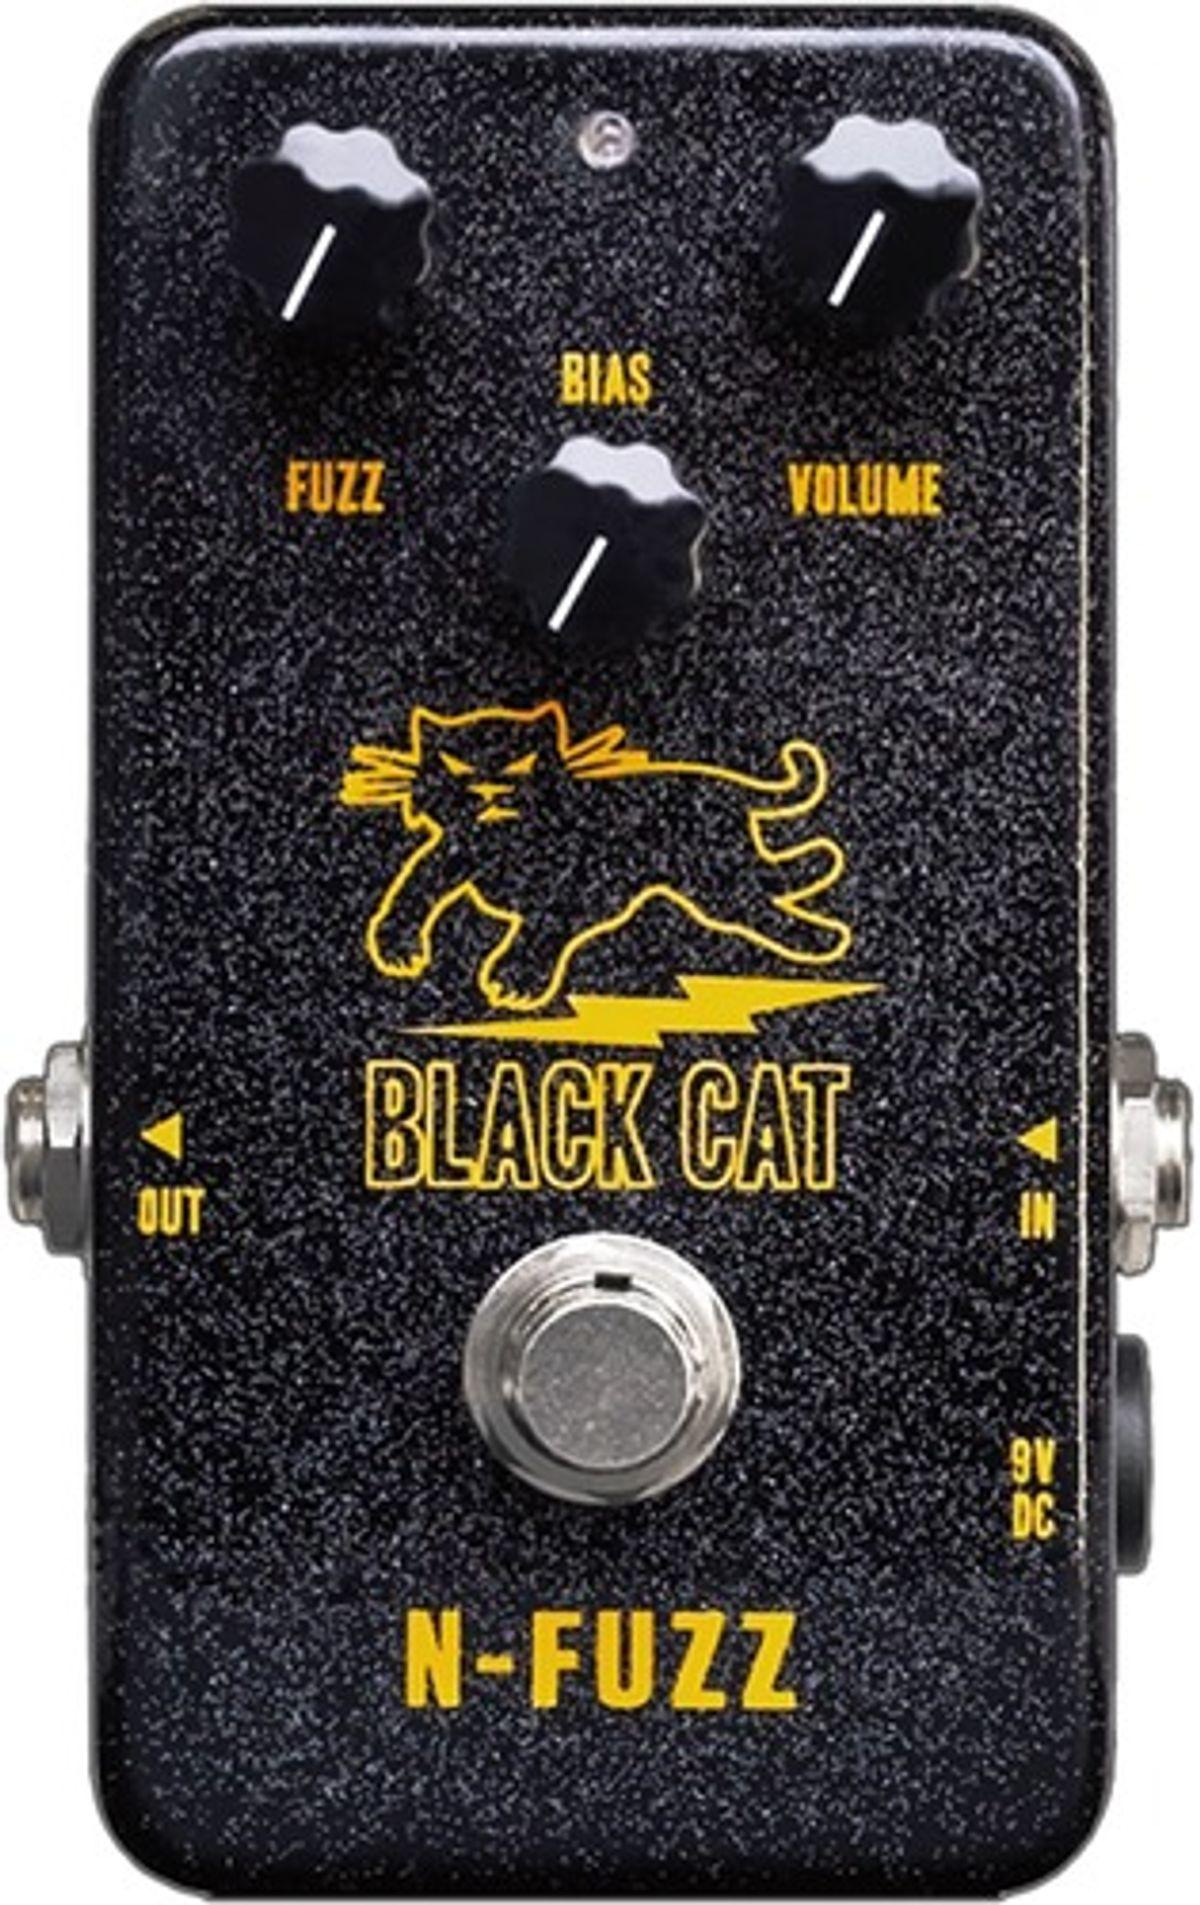 Black Cat Pedals Announces the N-Fuzz